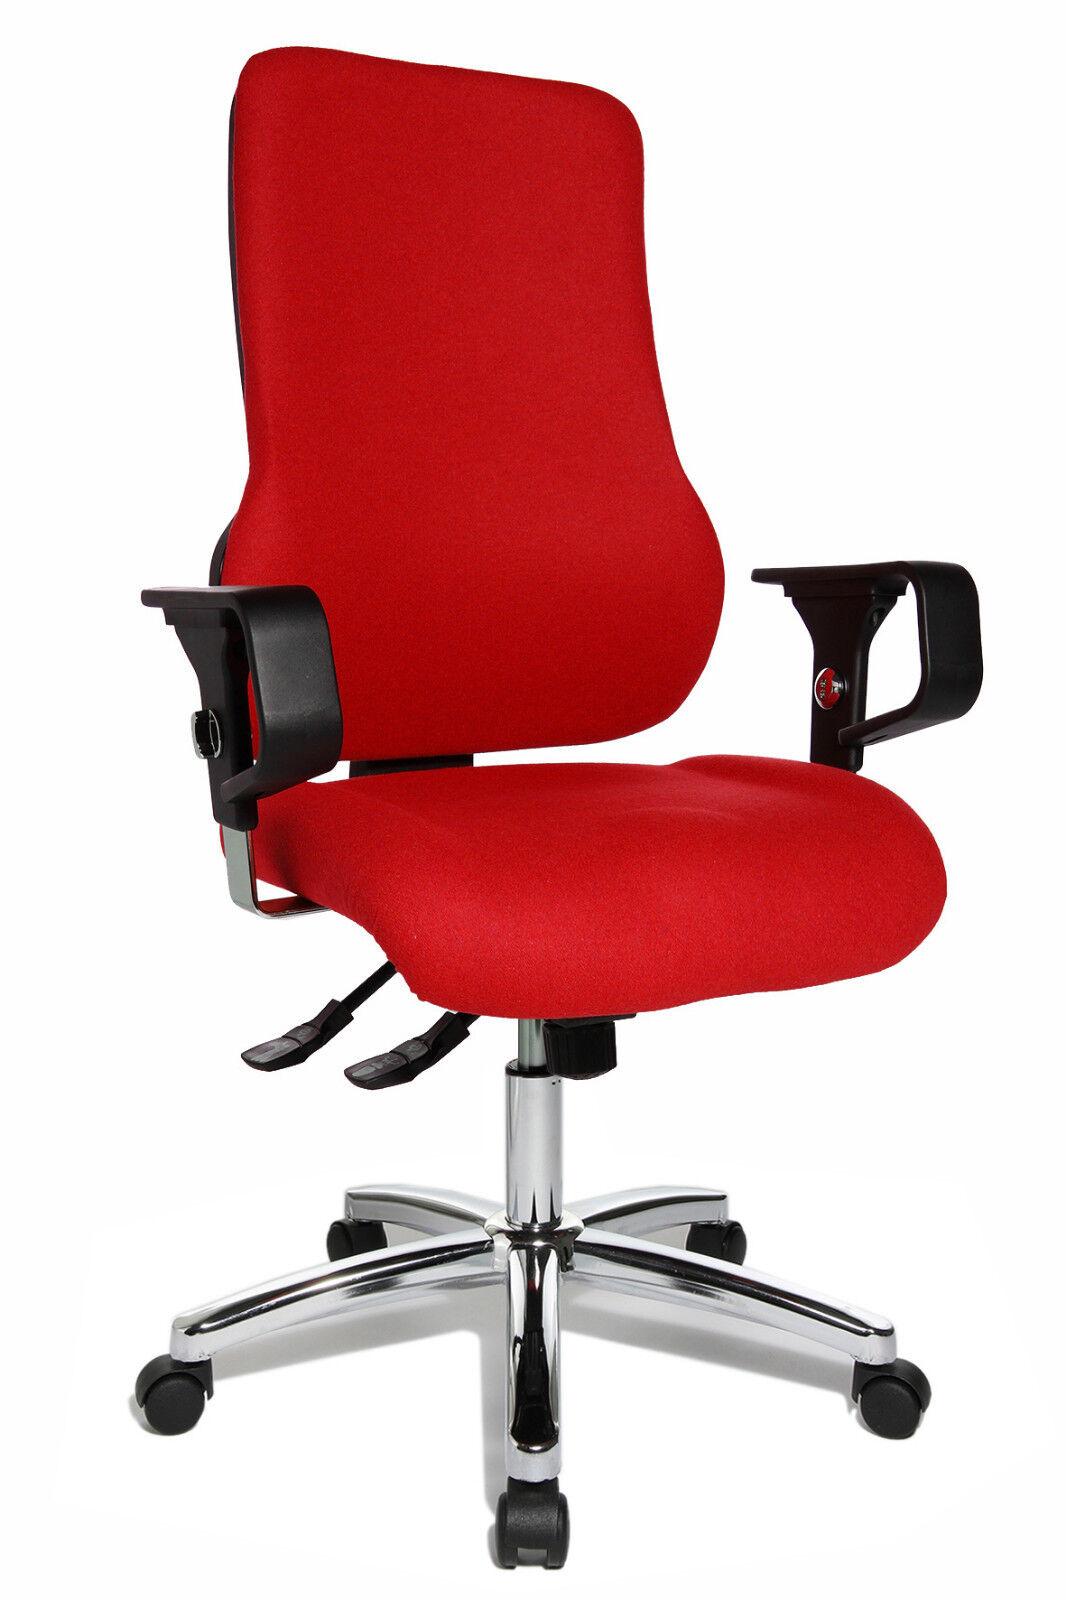 Bürostuhl Schreibtischstuhl Drehstuhl Bürosessel Topstar Point 50 schwarz B-Ware